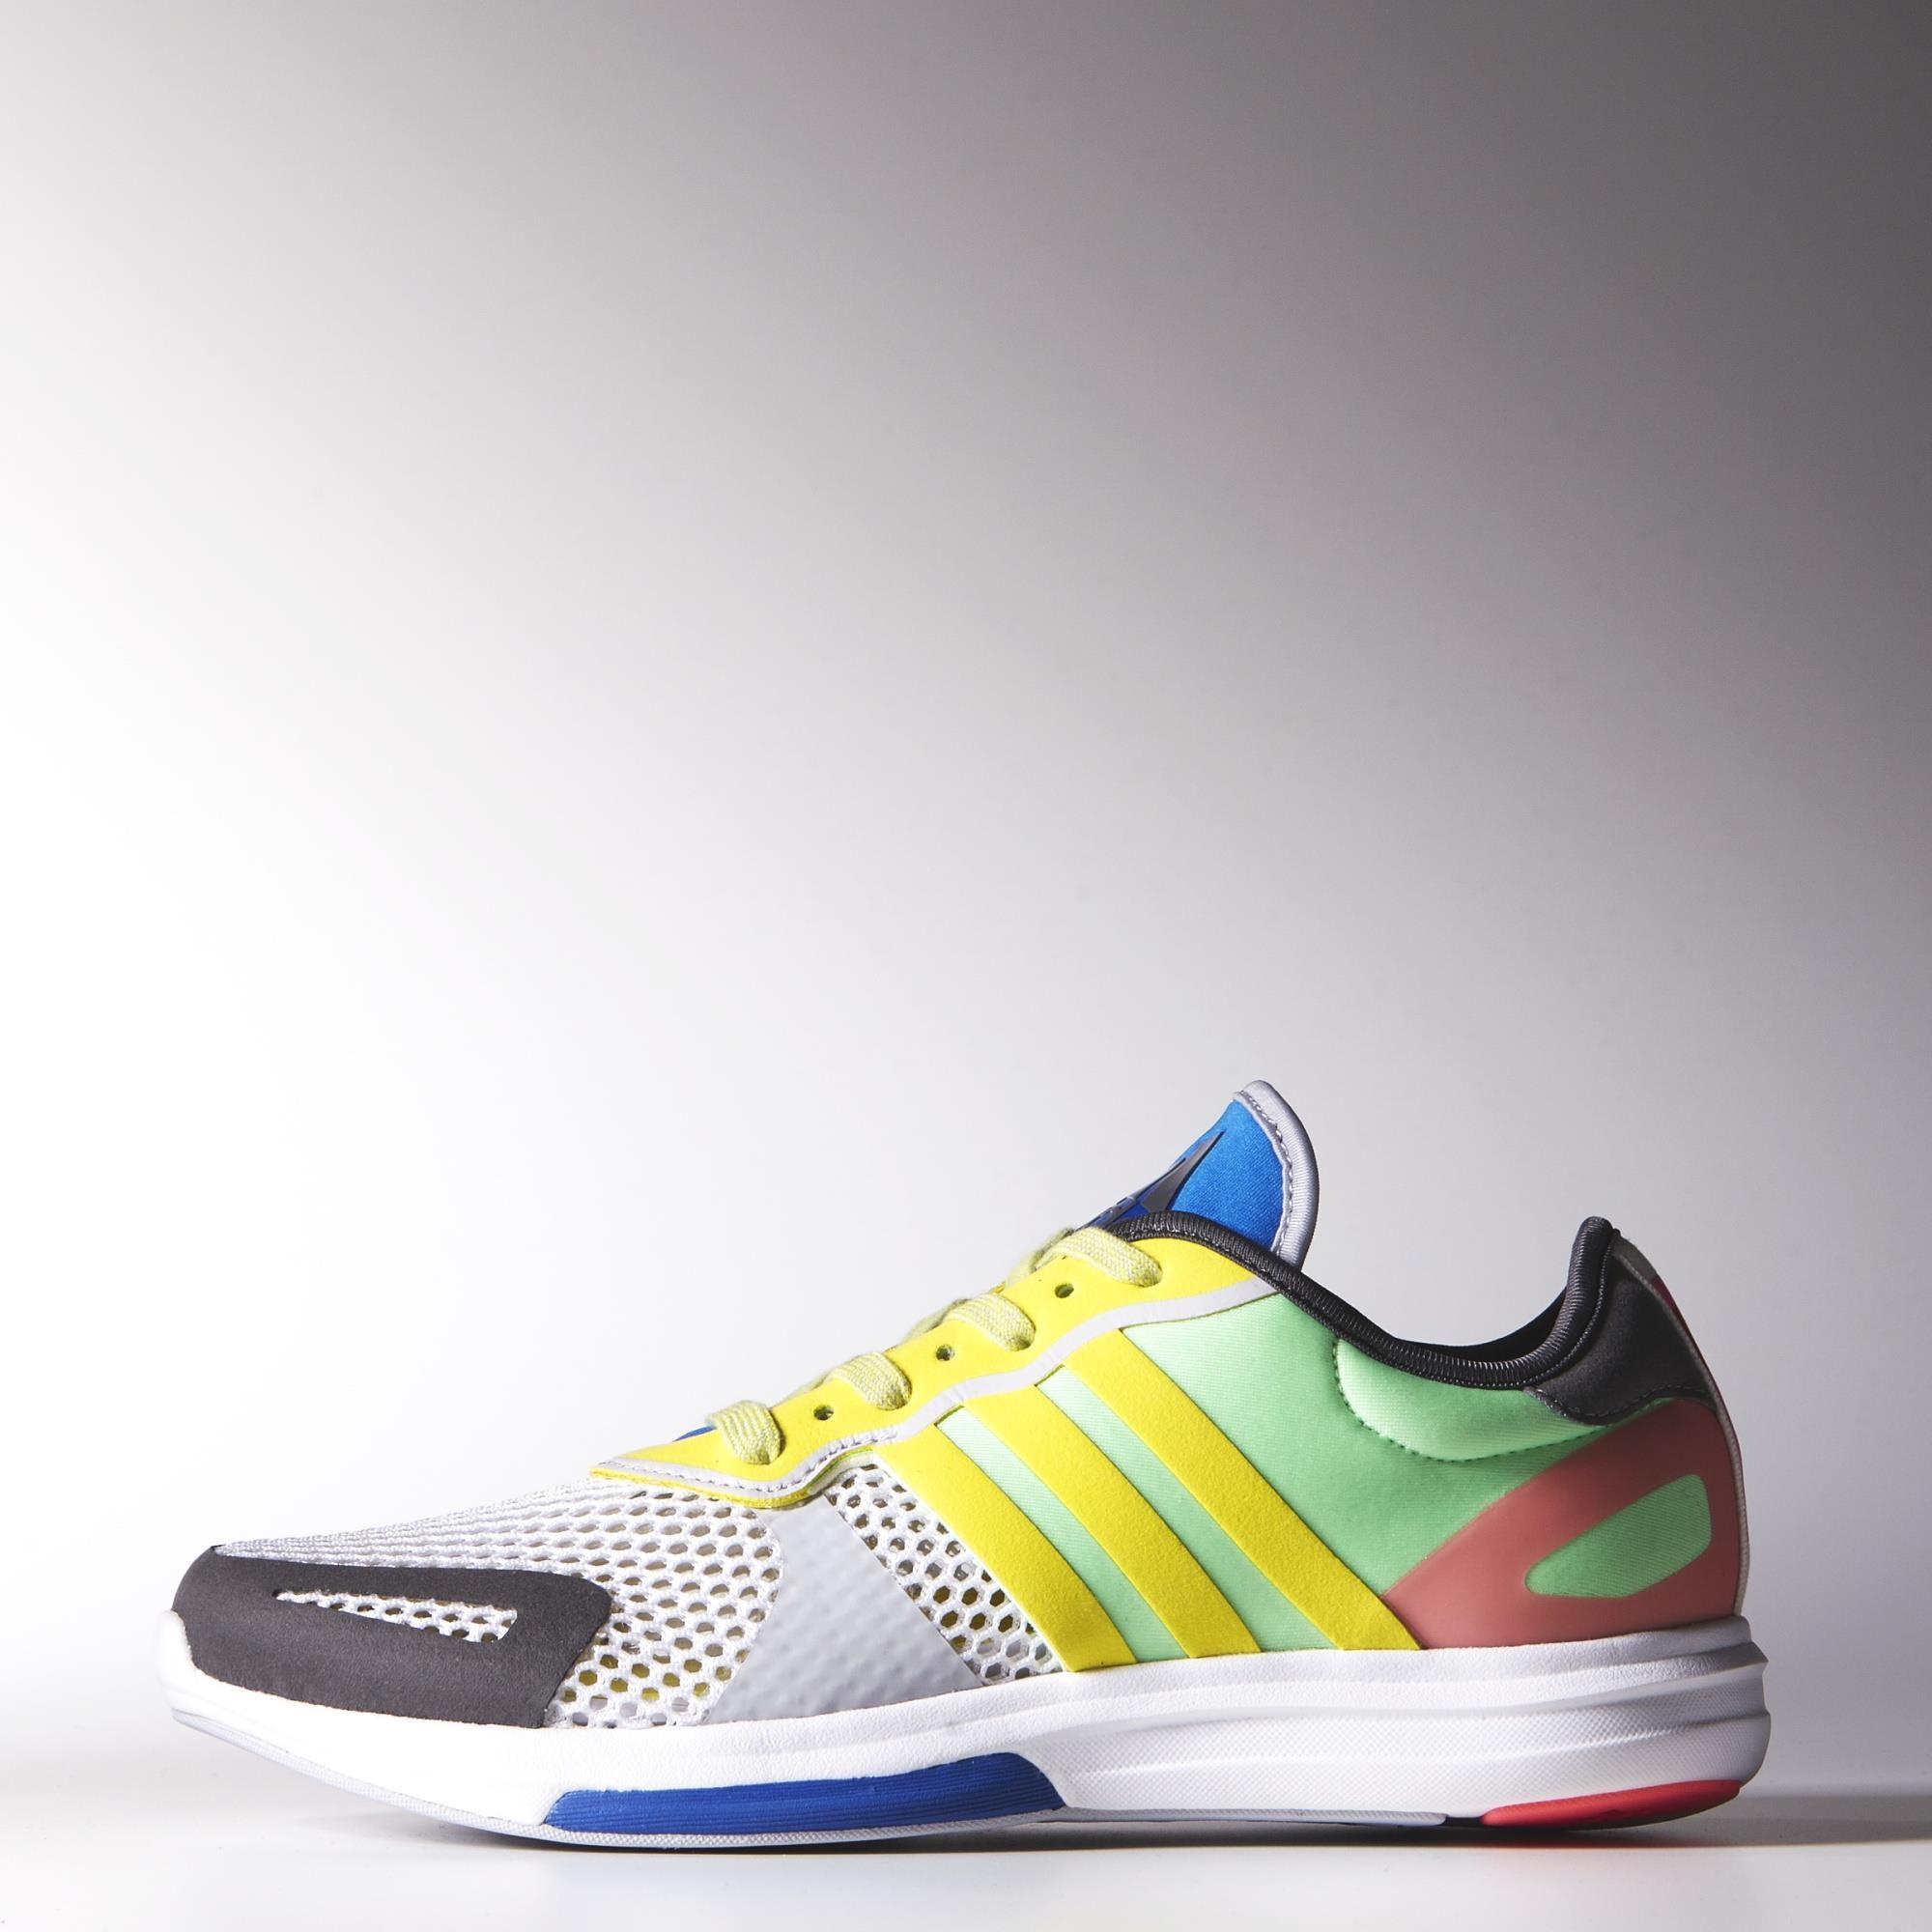 Stellasport schoenen Adidas Yvori grijs Regionaal SqwdEw